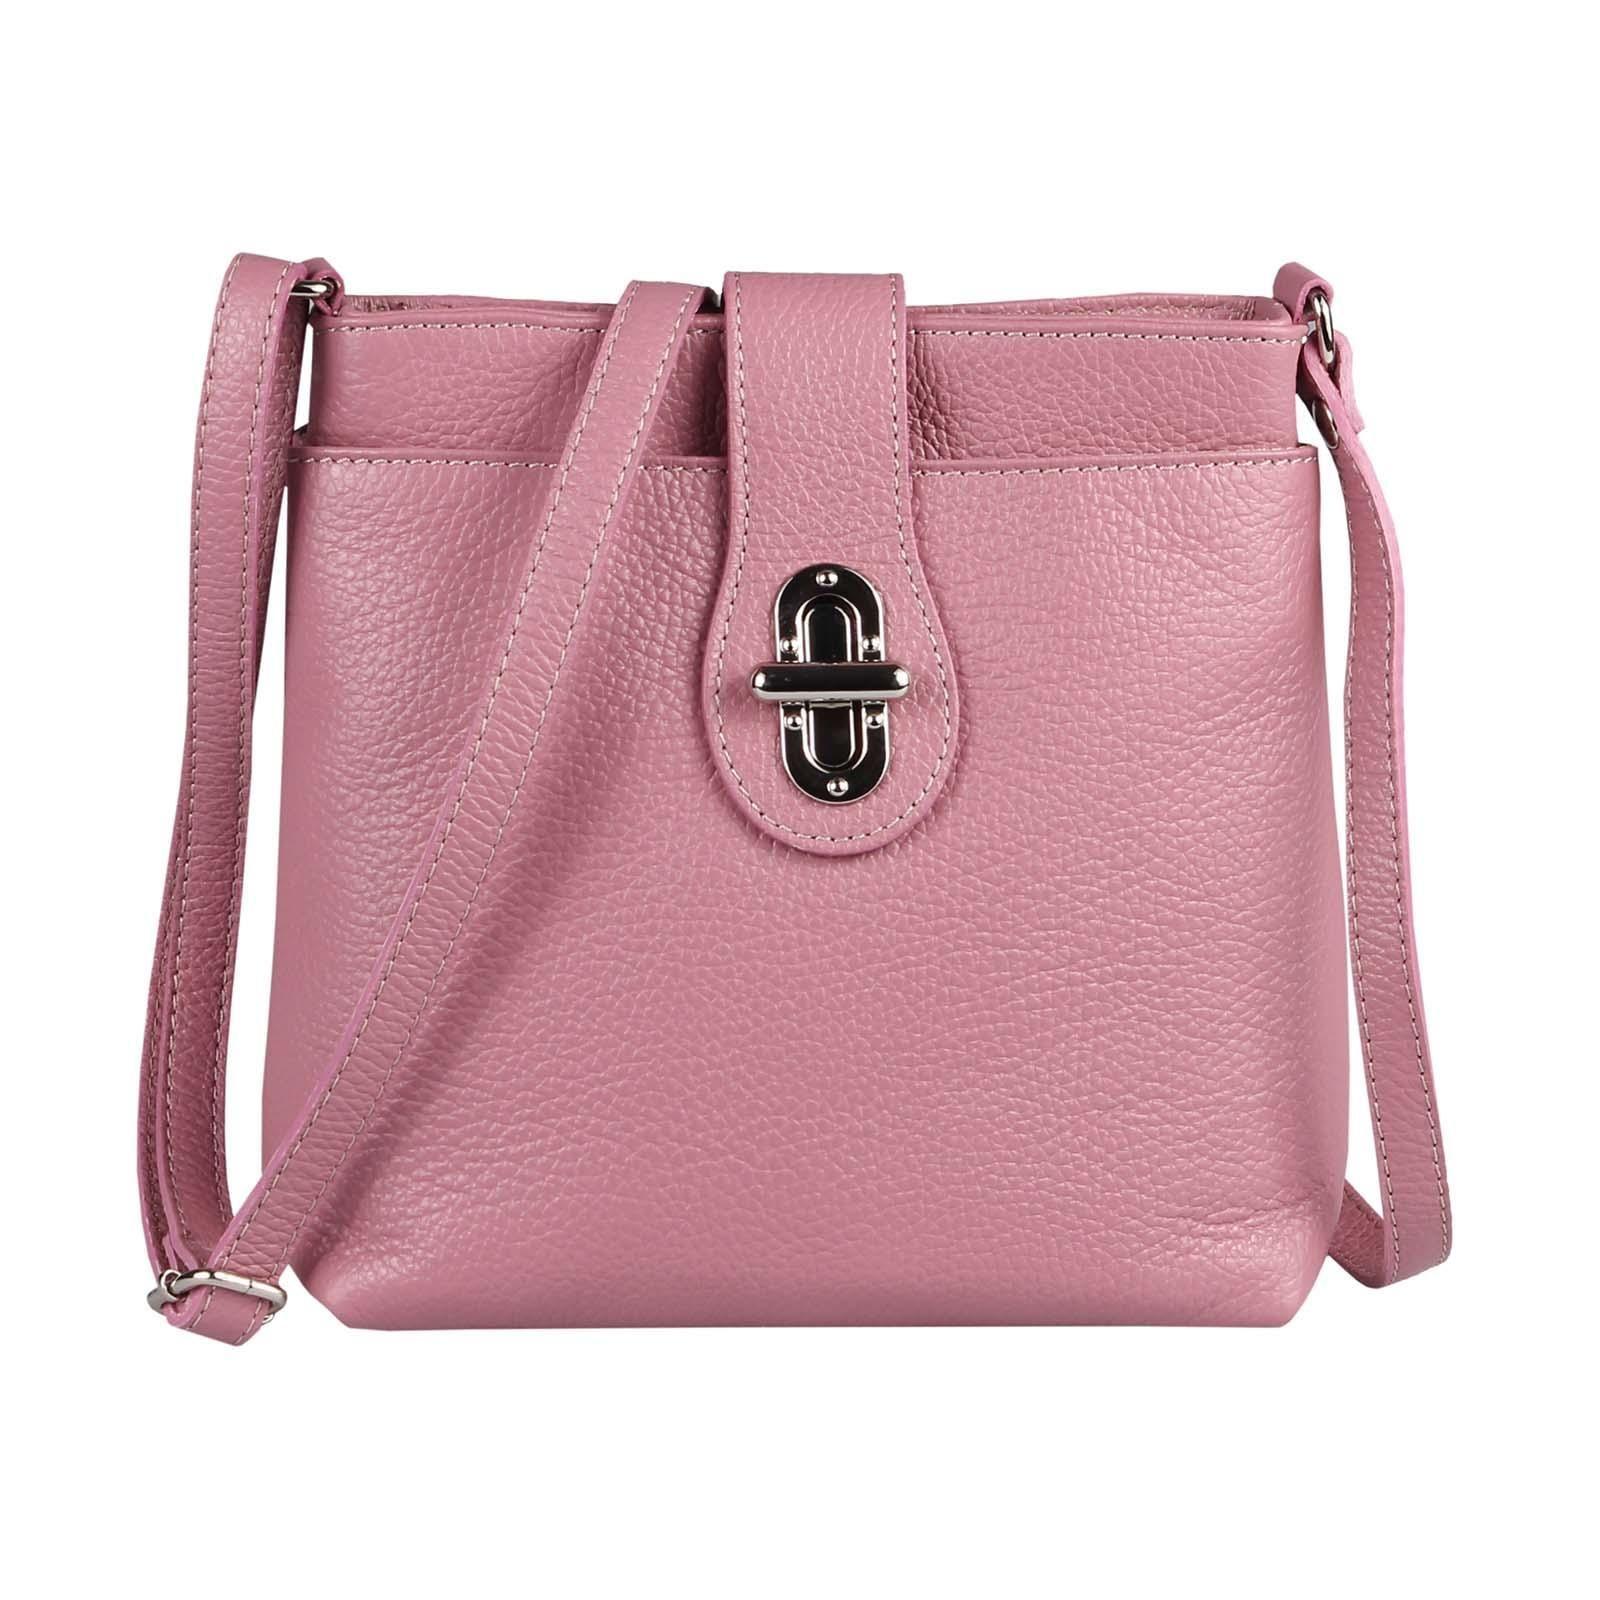 Schultertasche Umhngetasche Ledertasche Handtasche Crossover Altrosa Tasche Damen Leder City Tal Bagtal Damen Leder Tasche S Shoulder Bag Bags Leather Bag